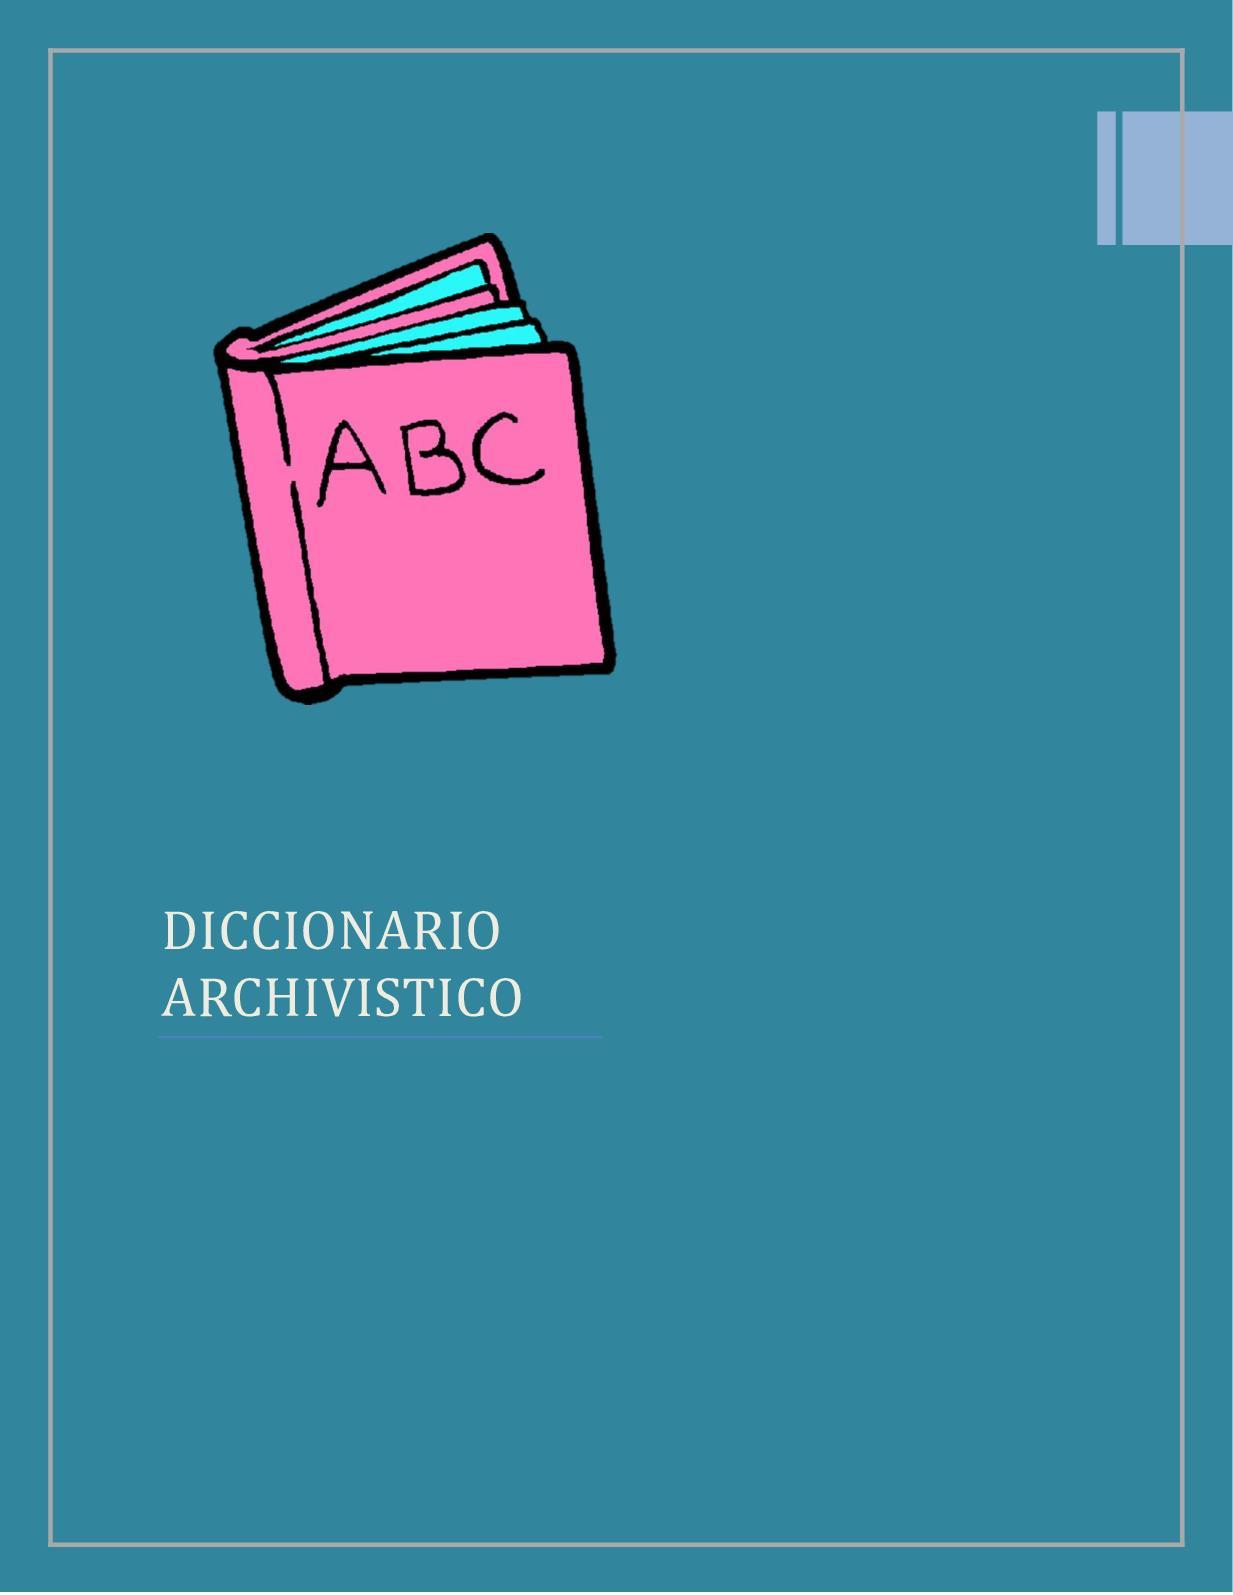 Calaméo - Diccionario Avansado 1 Docx 11